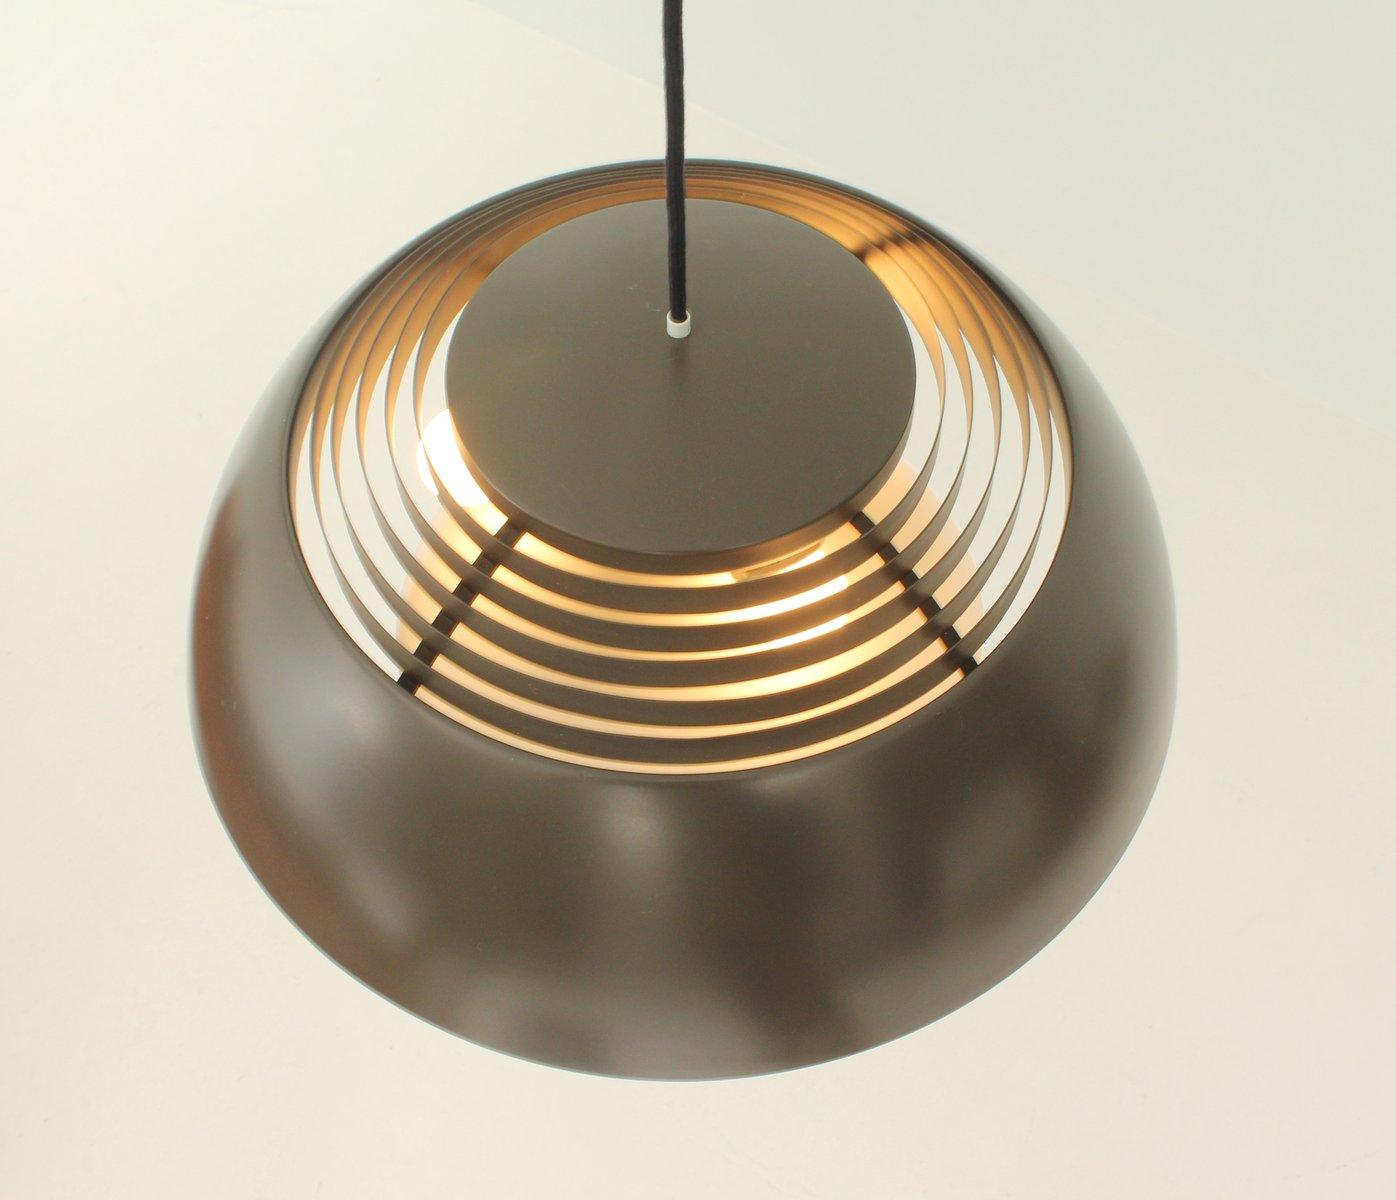 dunkelbraune aj royal lampe von arne jacobsen f r louis. Black Bedroom Furniture Sets. Home Design Ideas